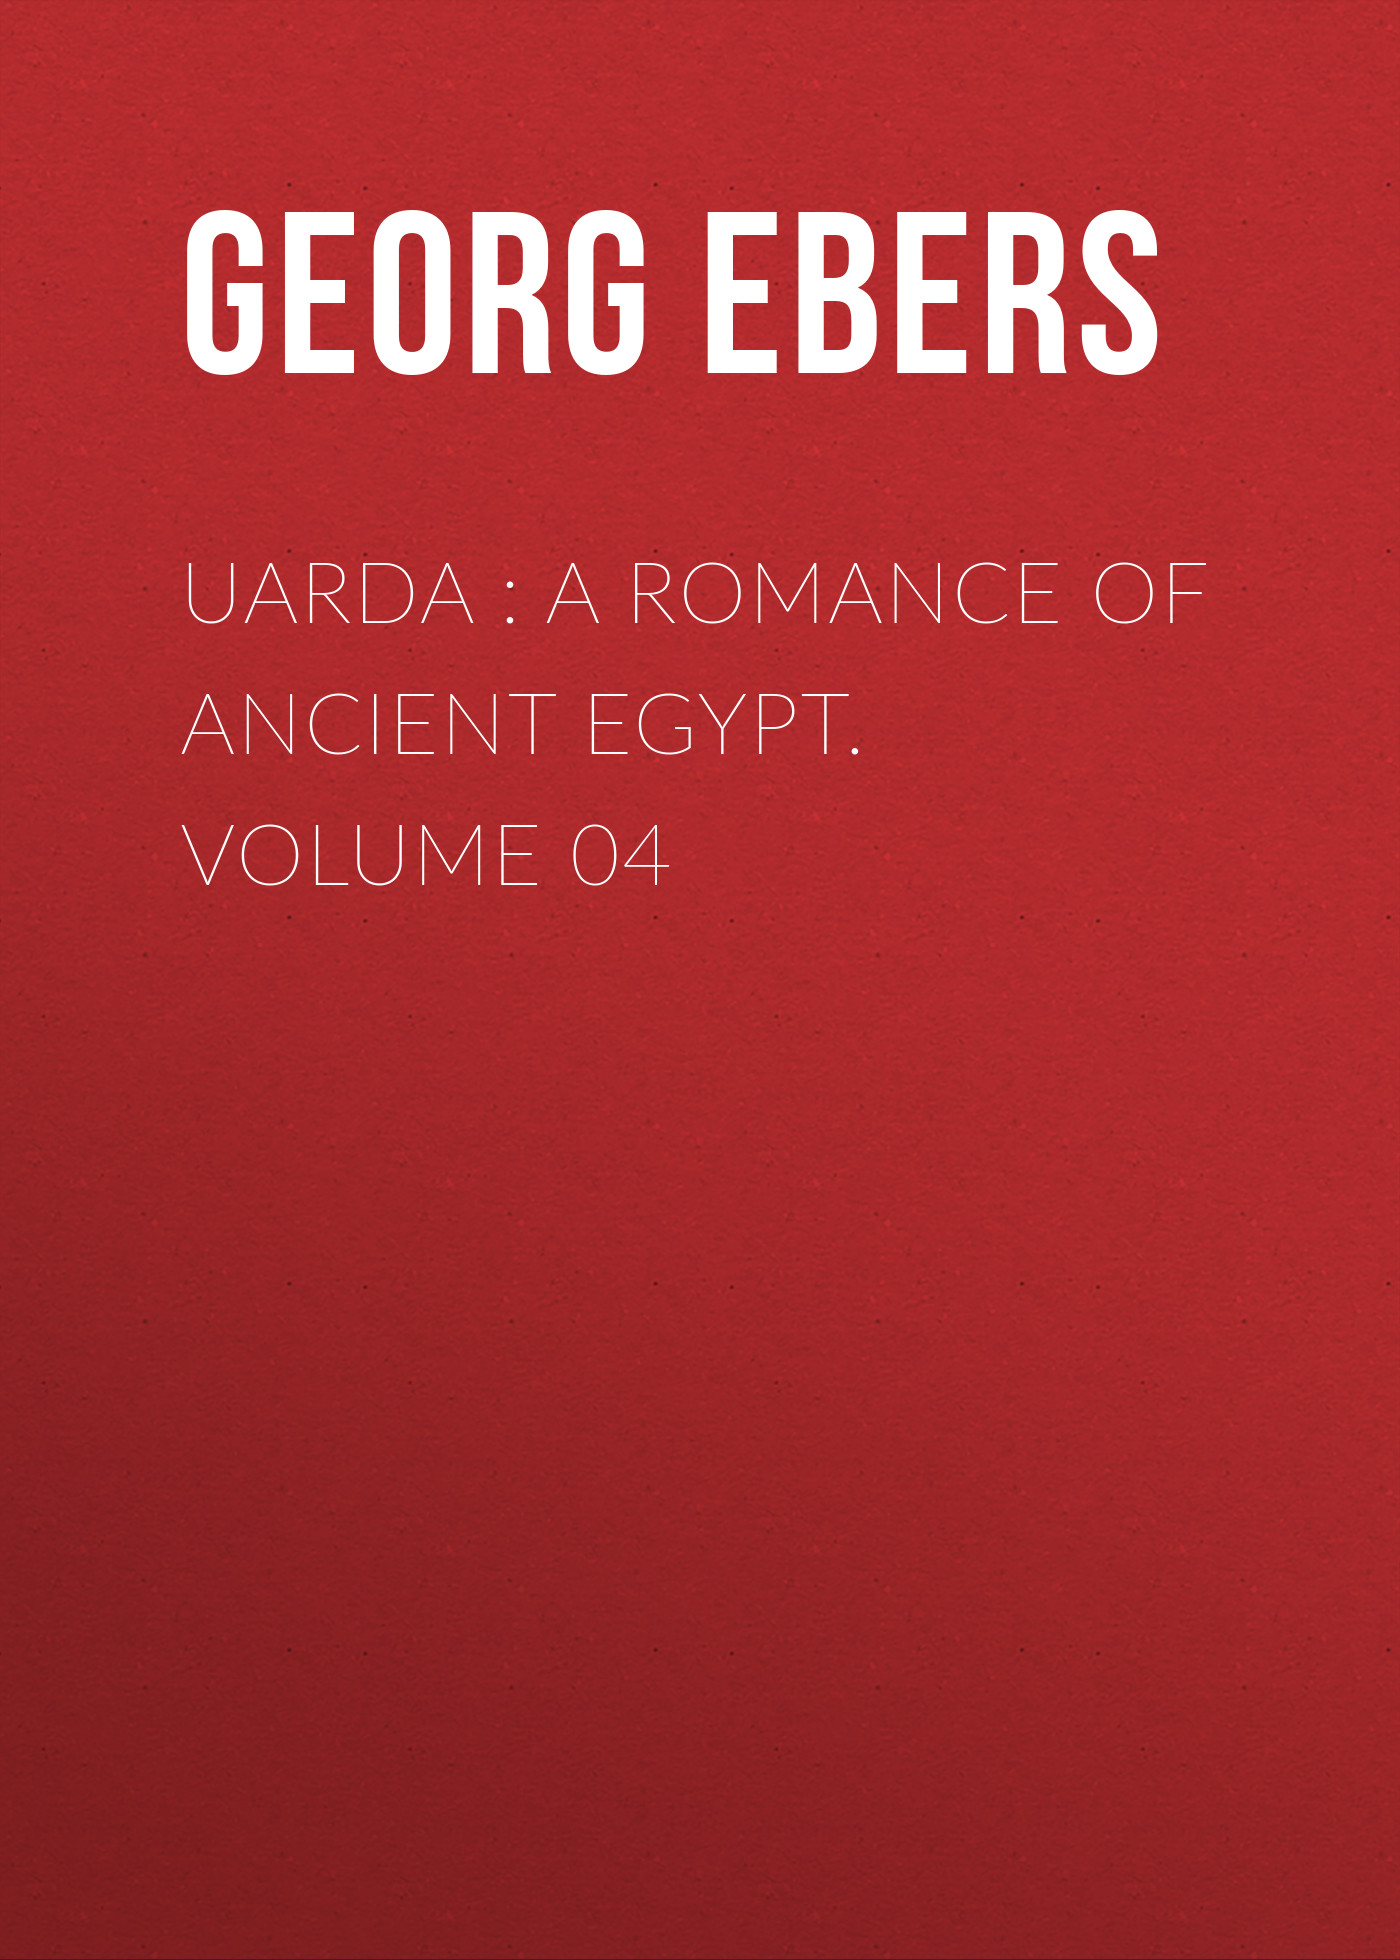 Georg Ebers Uarda : a Romance of Ancient Egypt. Volume 04 ancient egypt